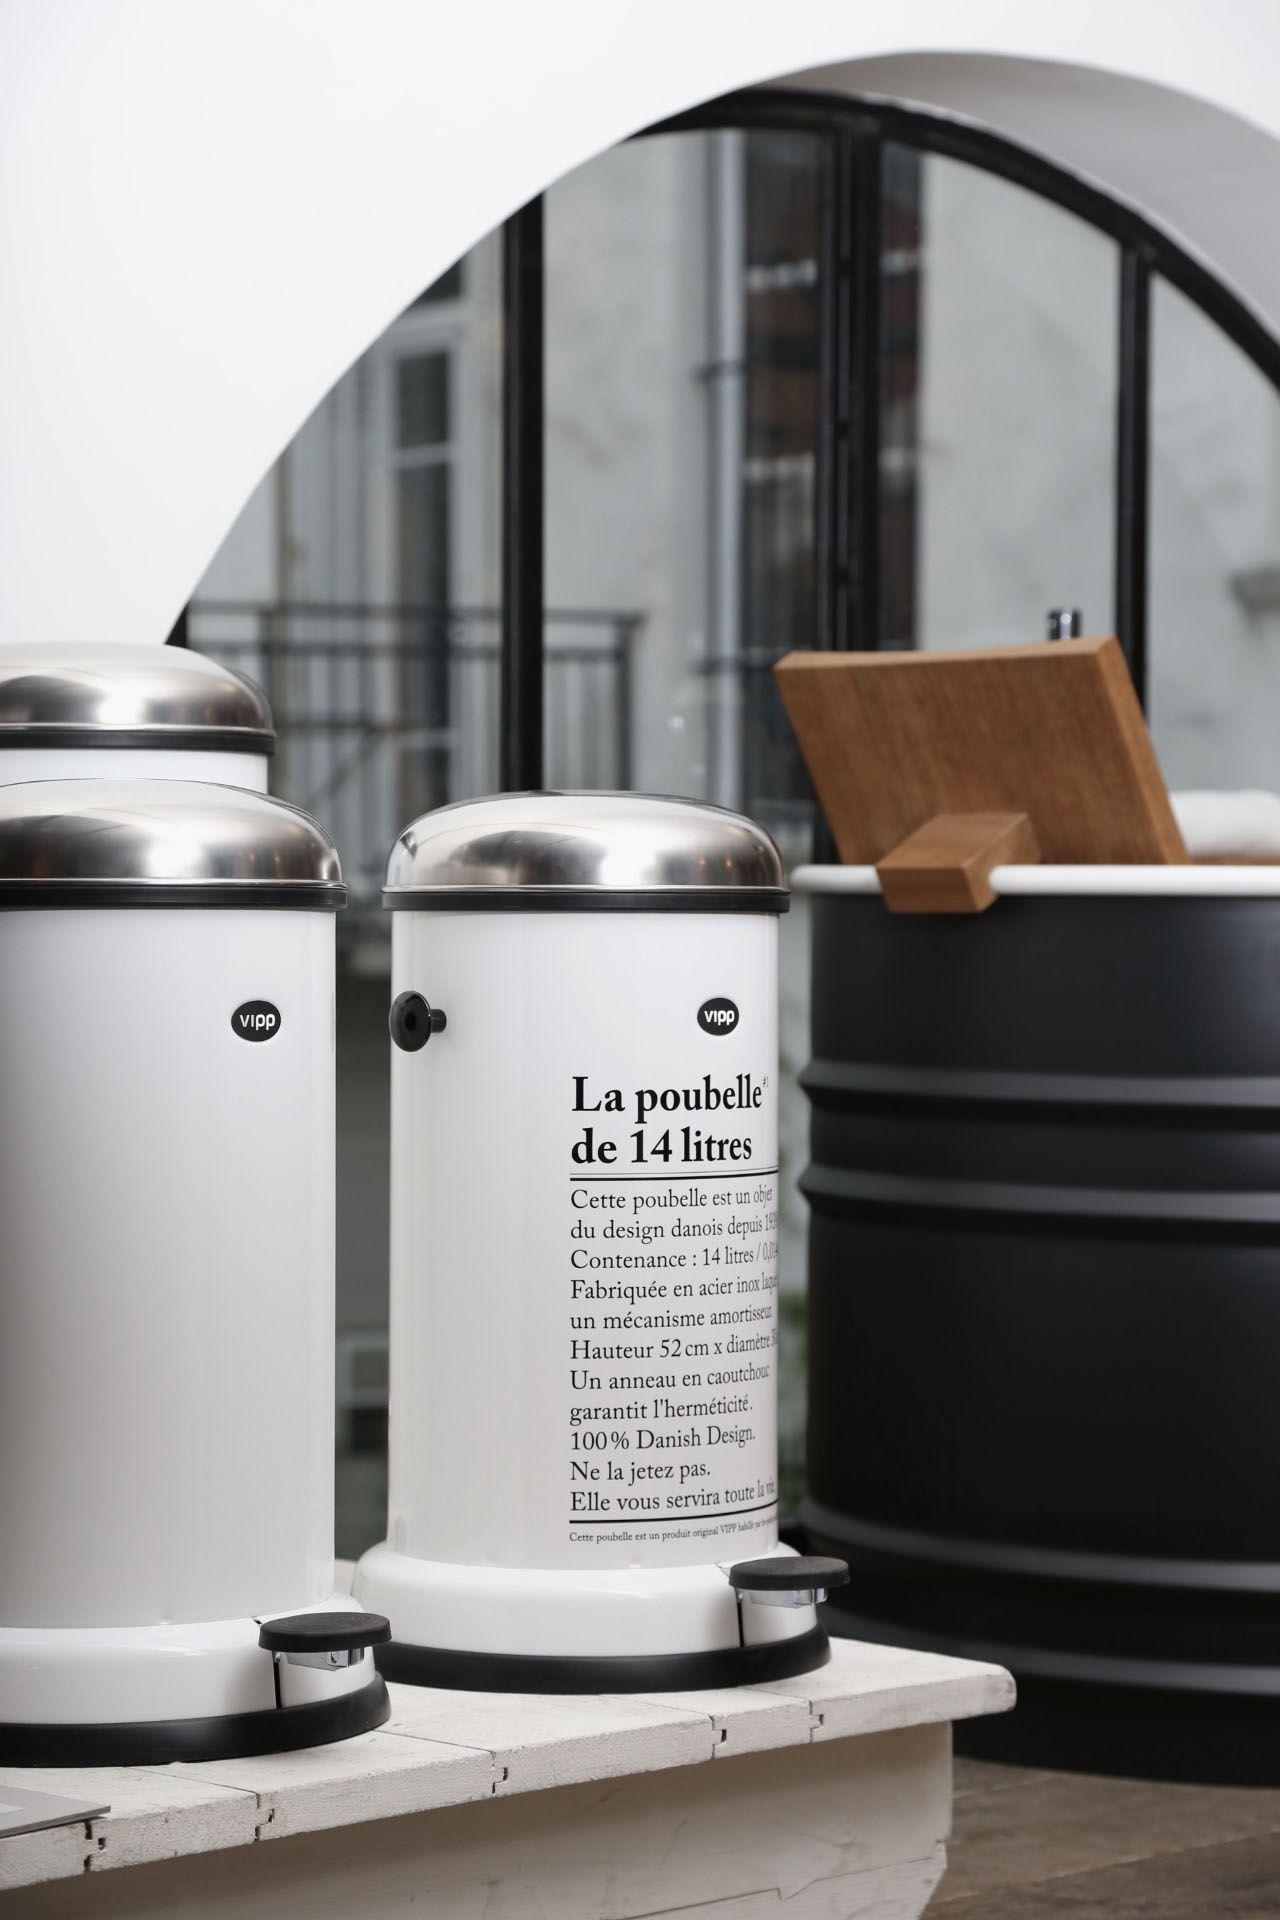 Poubelle Vipp la poubelle vipp #mercishopparis | m e r c i | pinterest | interiors